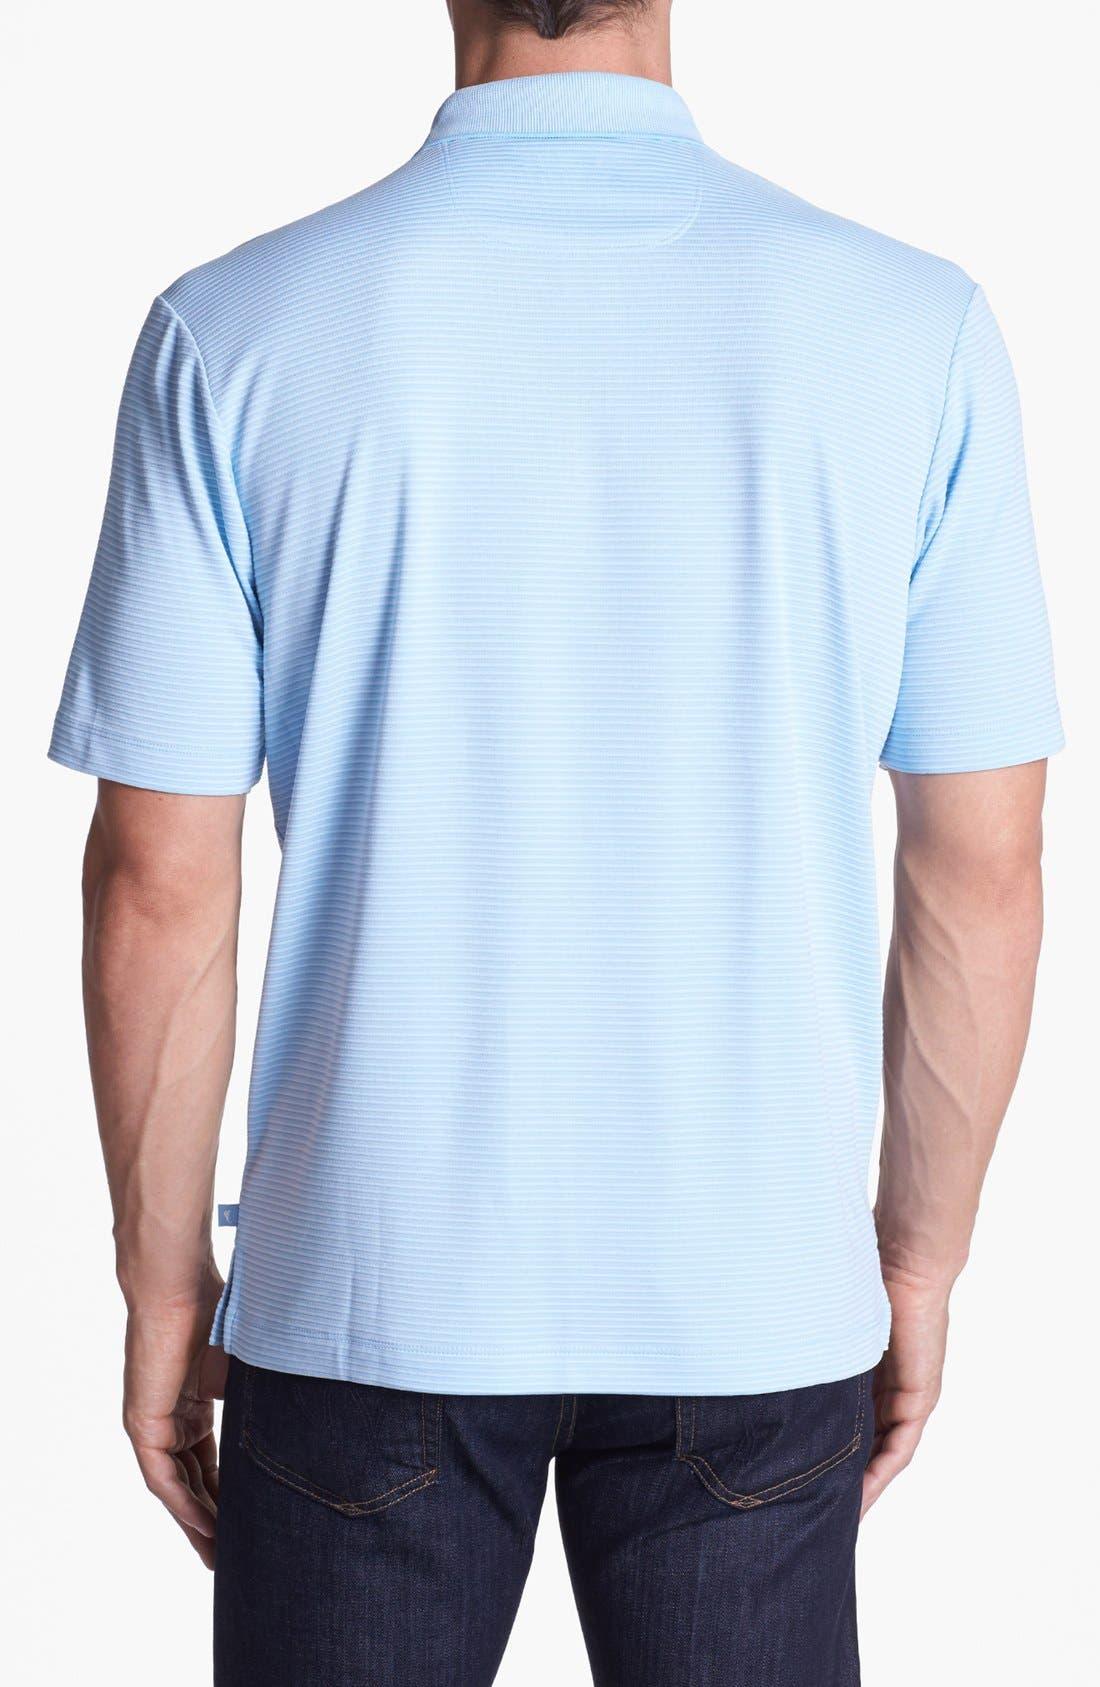 Alternate Image 2  - Tommy Bahama 'Superfecta' Stripe Polo